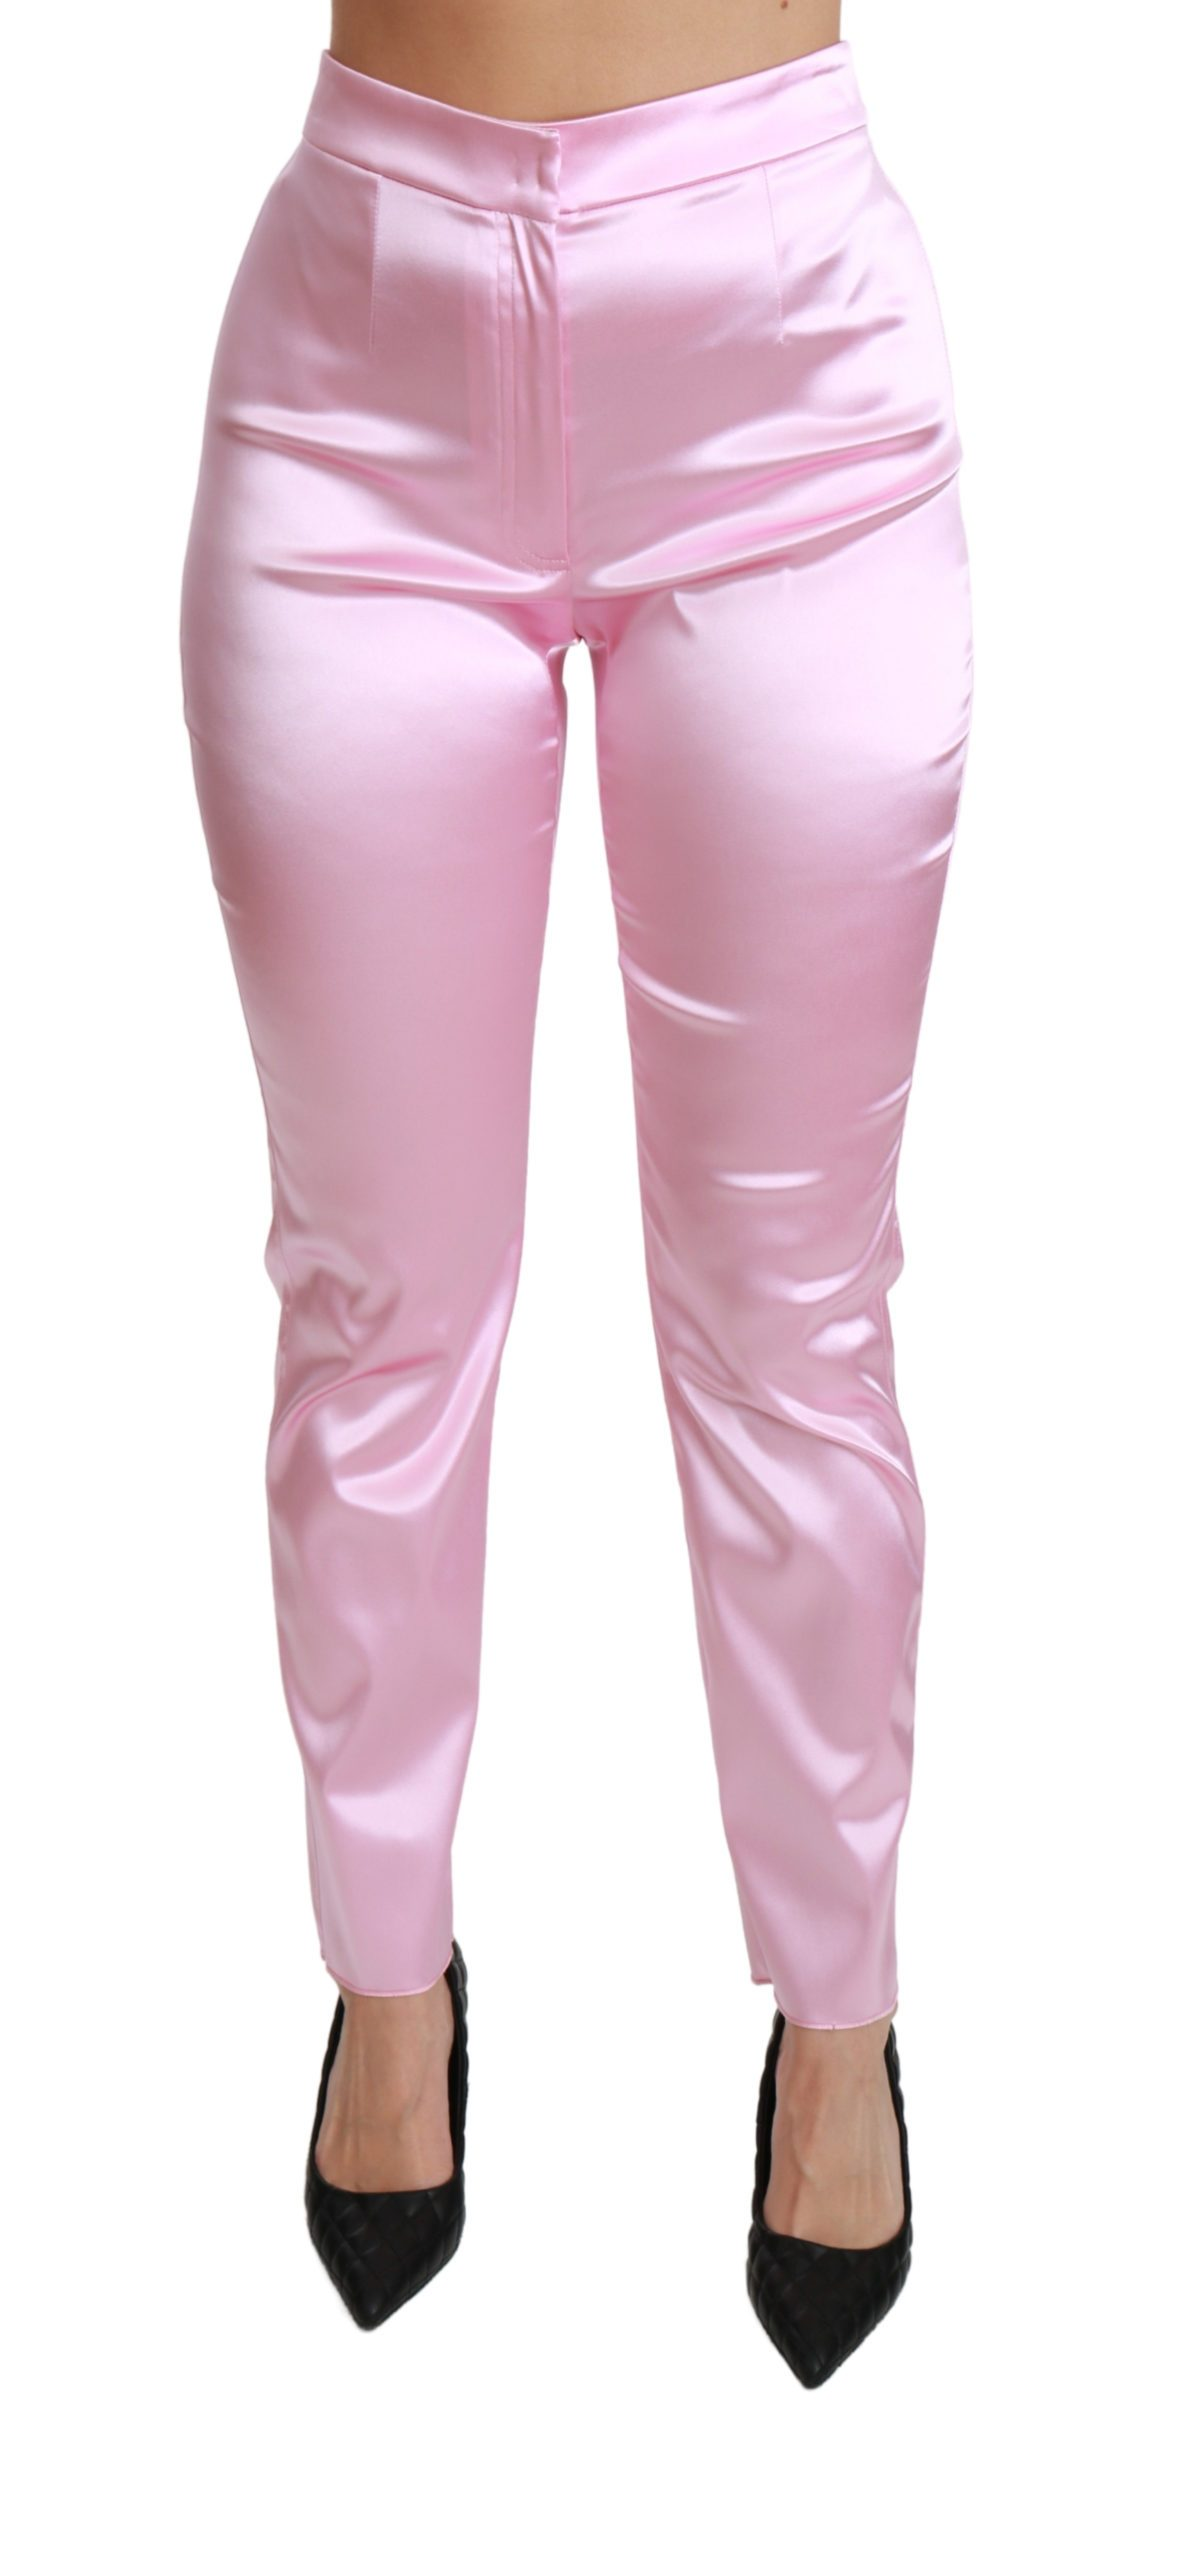 Dolce & Gabbana Women's Metallic High Waist Skinny Trouser Pink PAN70816 - IT44|L